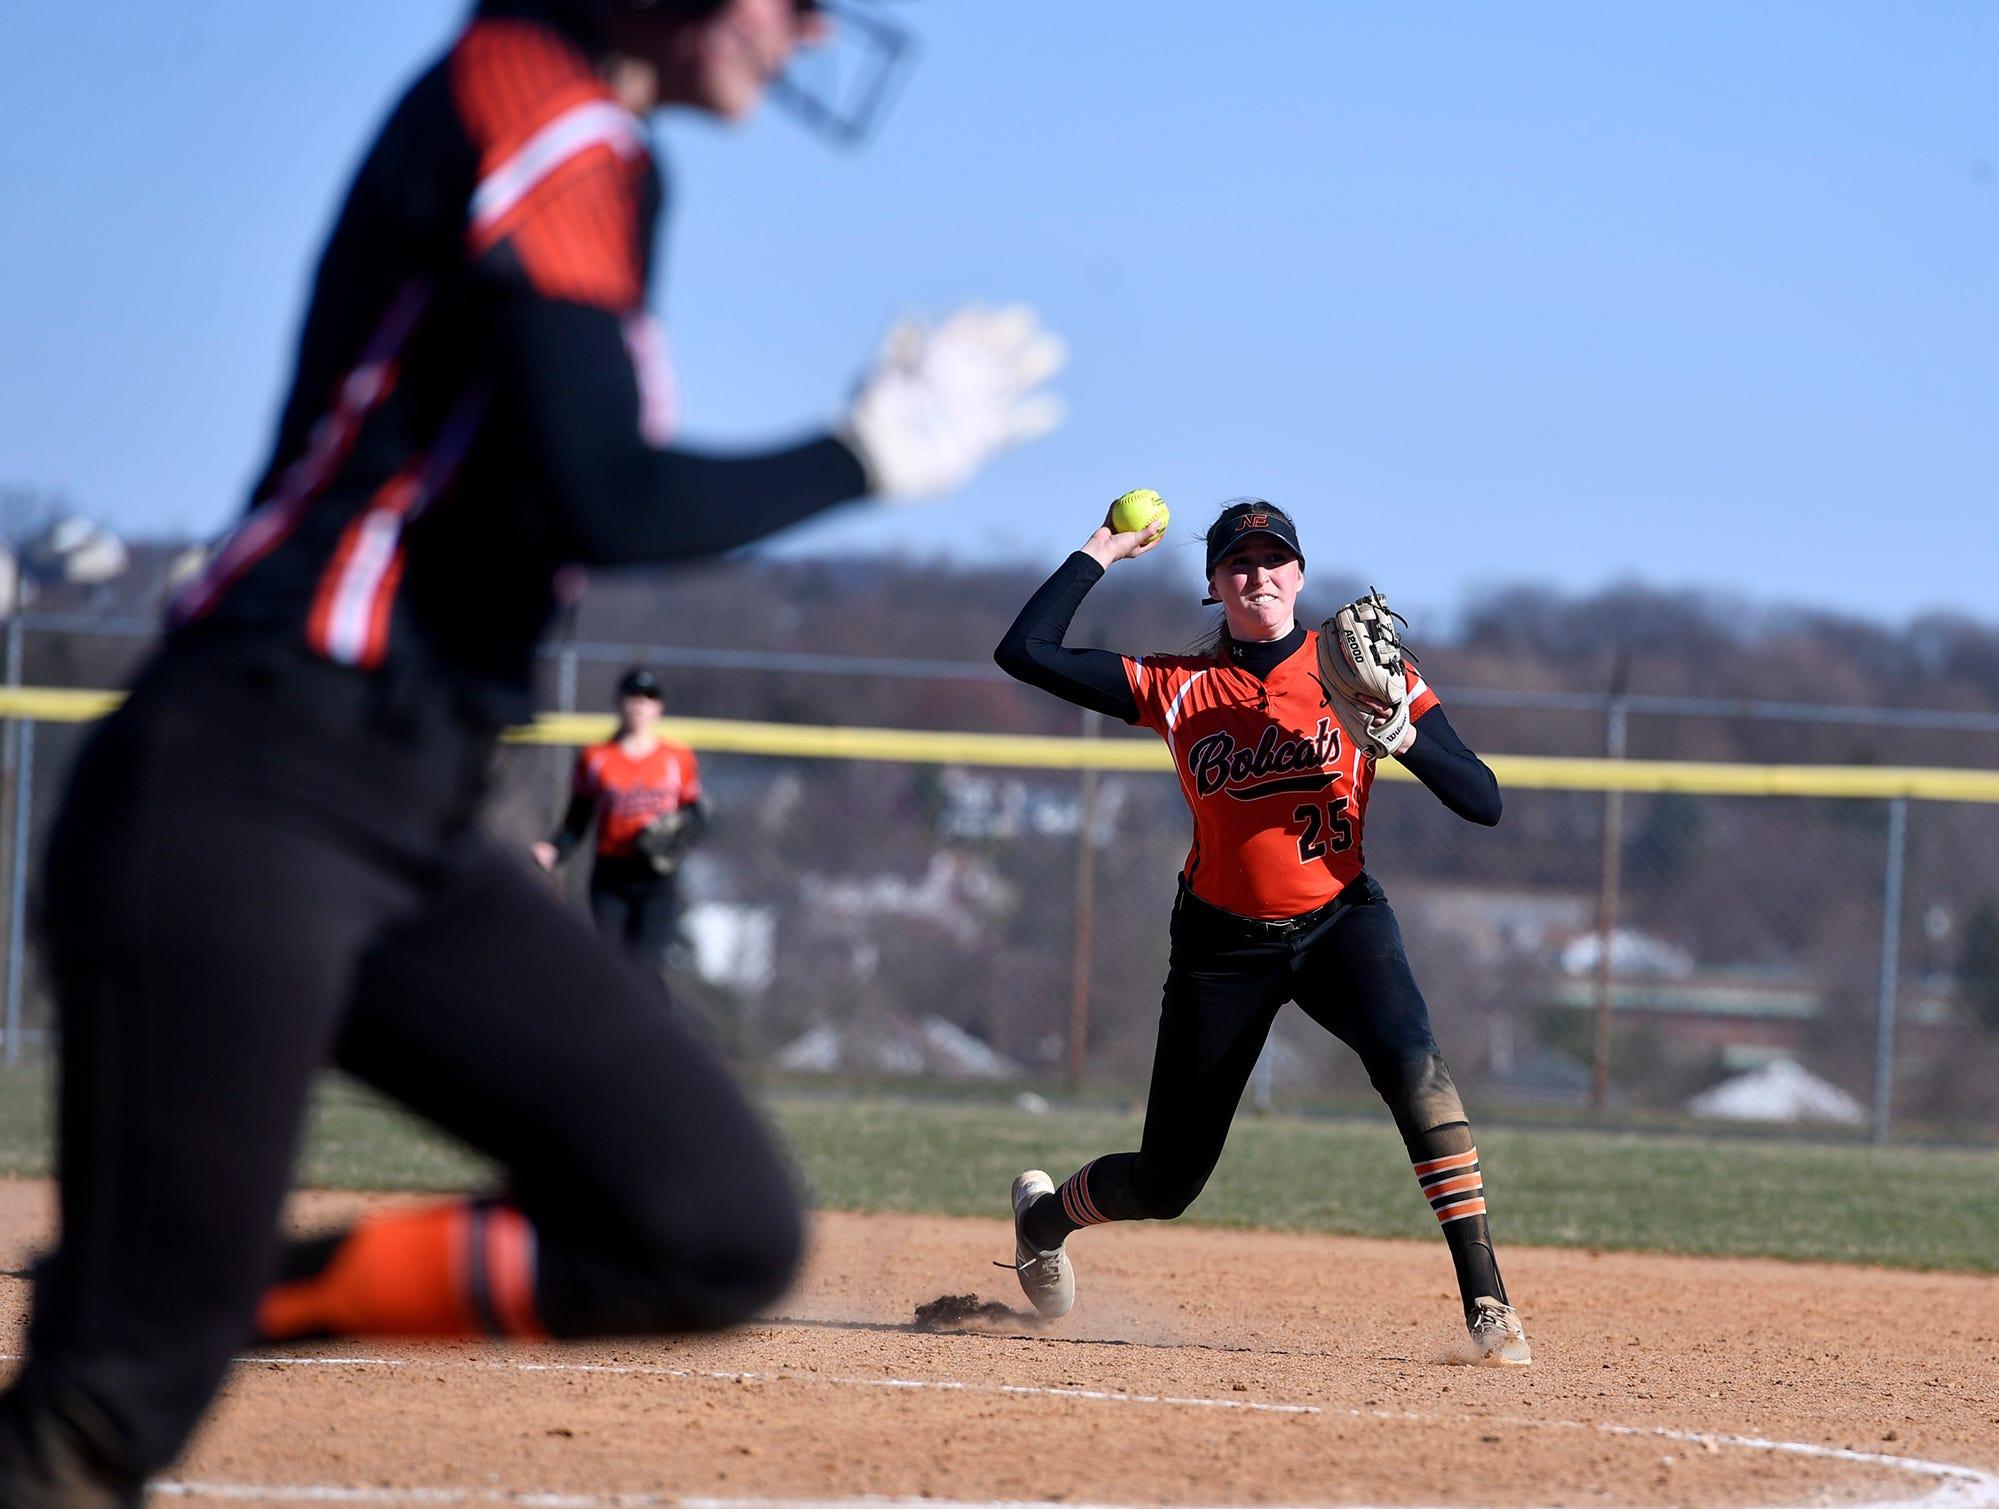 Central York at Northeastern softball, Monday, April 1, 2019.John A. Pavoncello photo